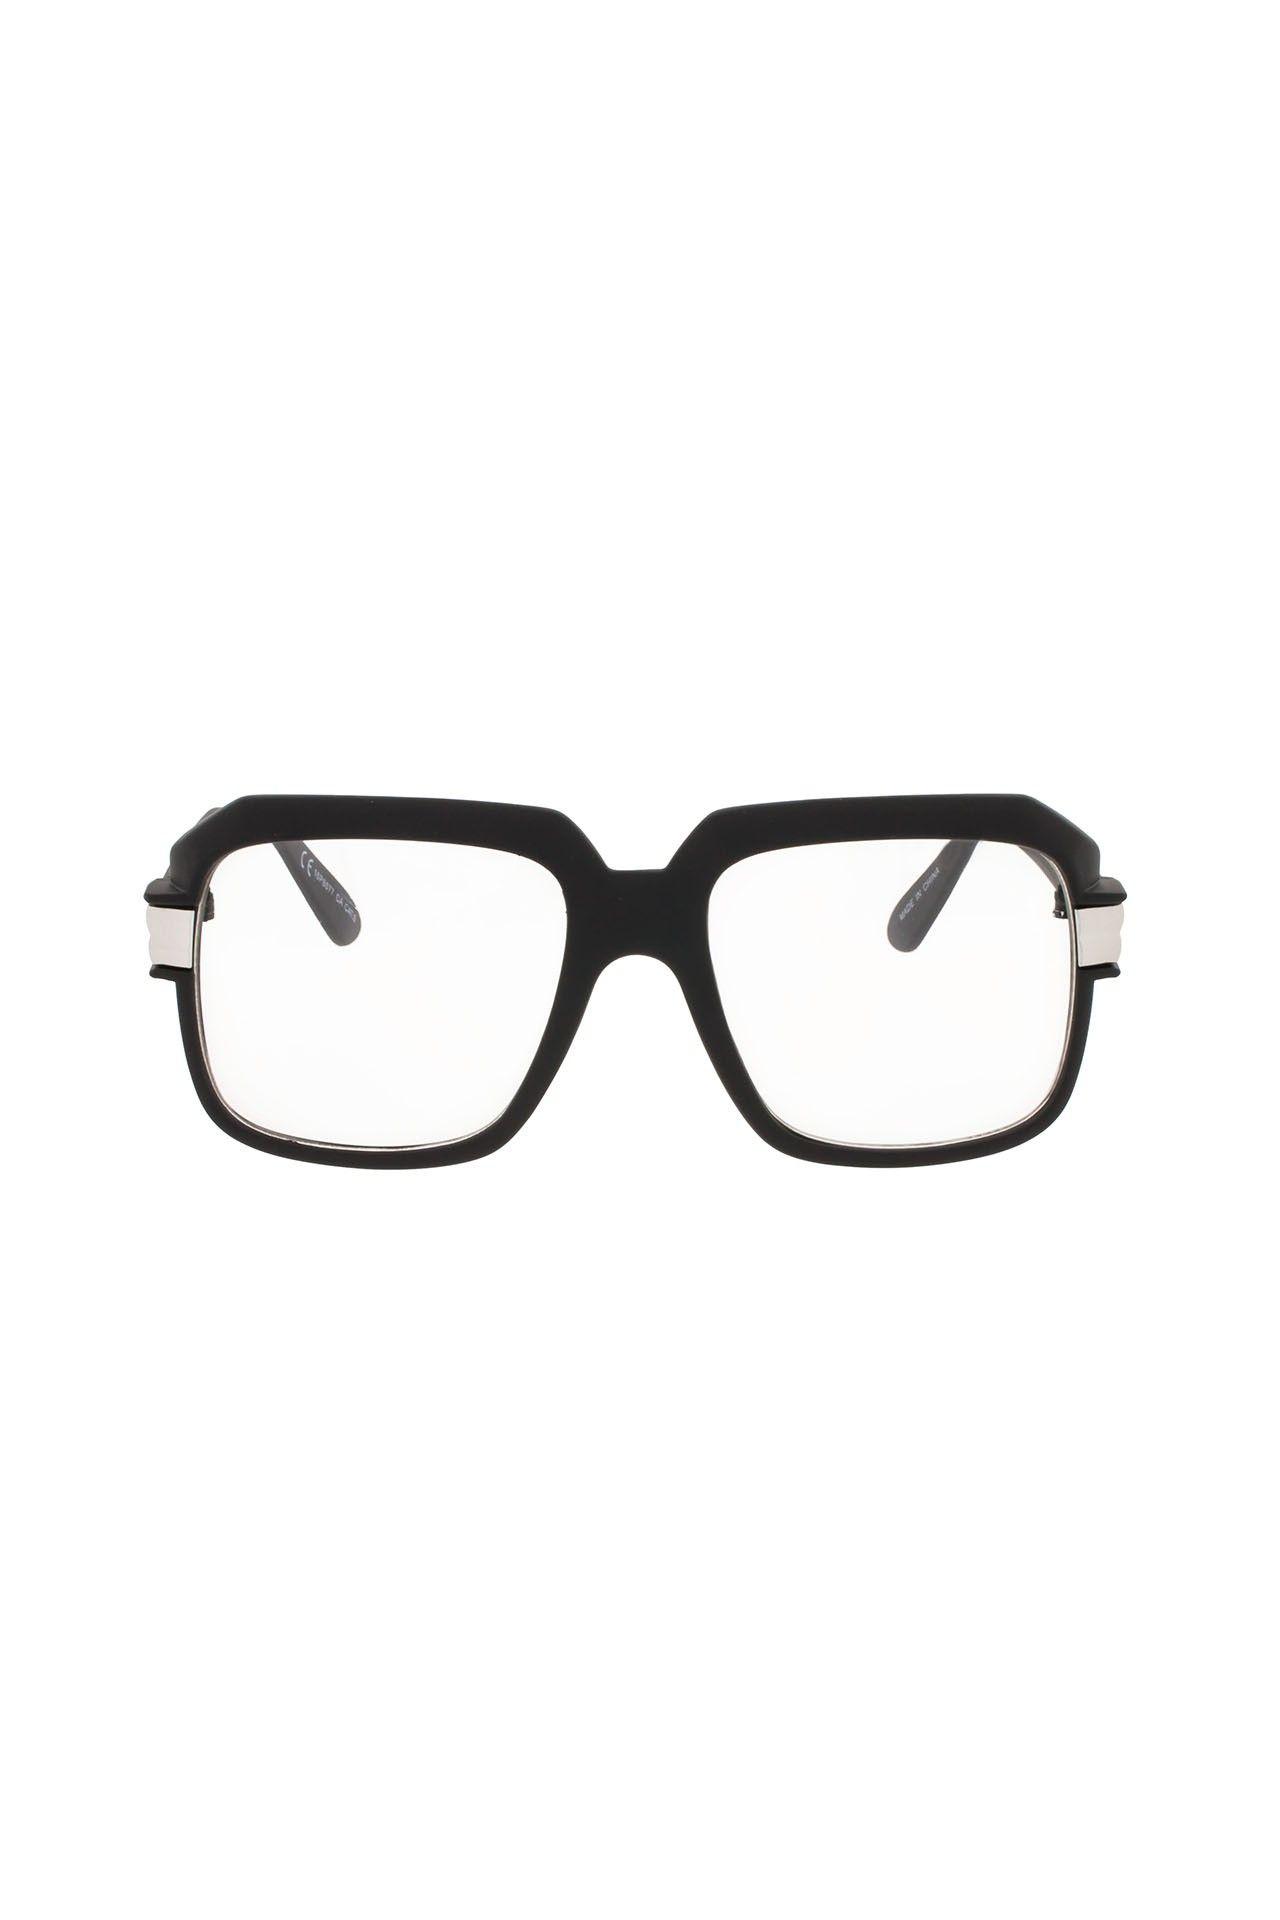 Afbeelding van Icon Eyewear 16P8577 Ca Rubberized Black / Clear